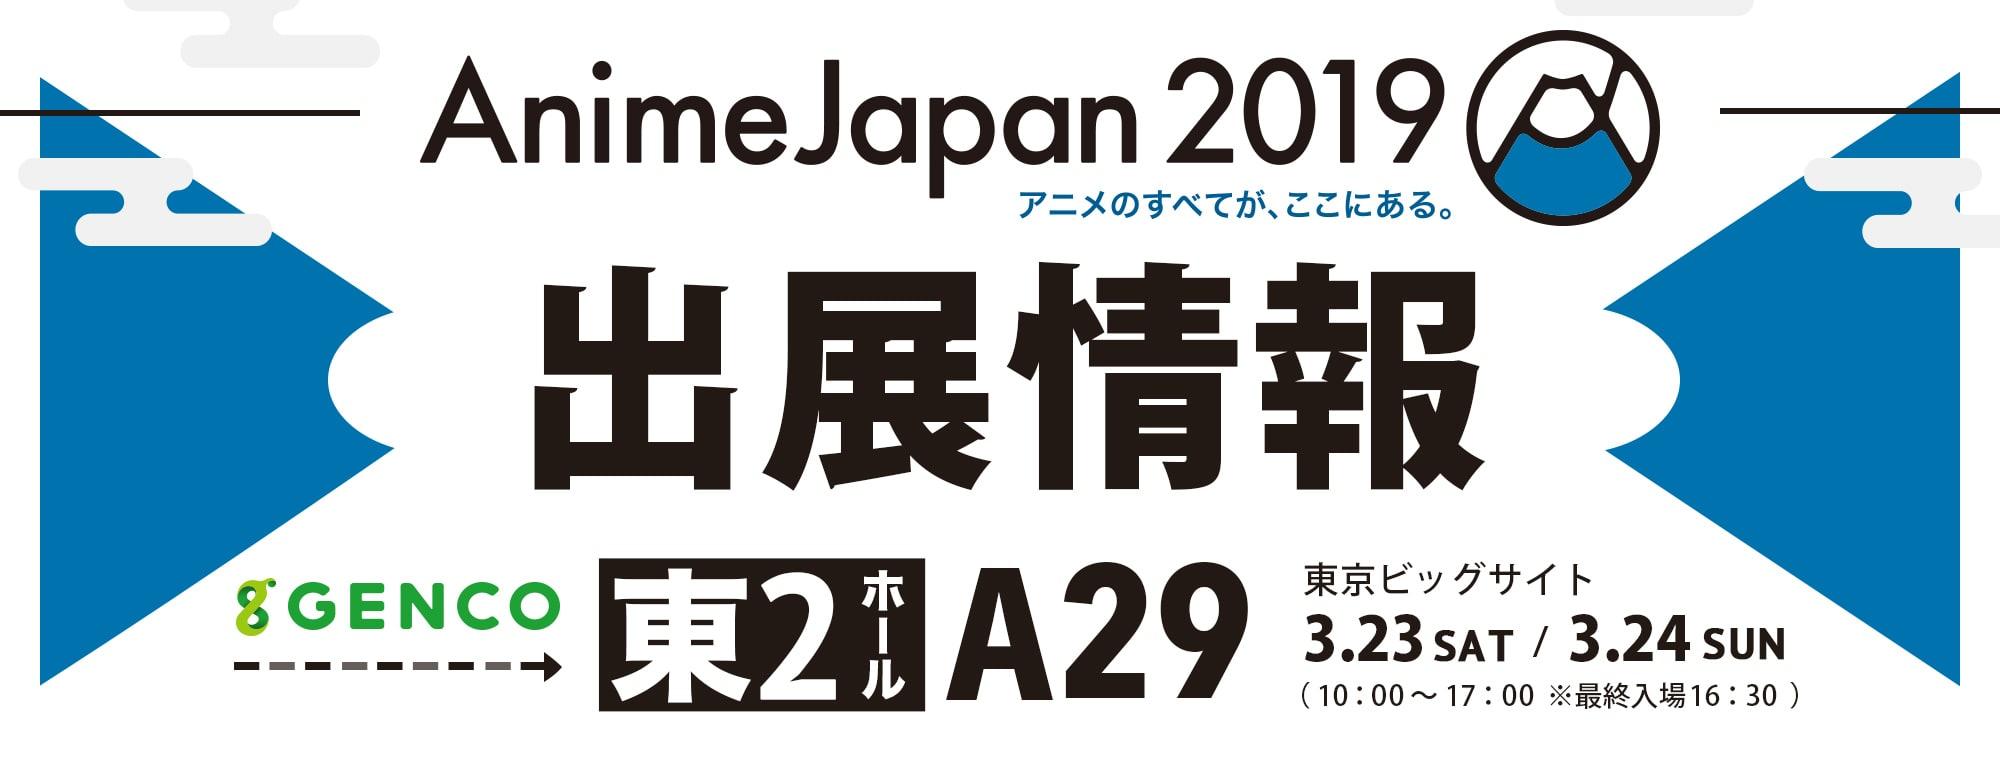 AnimeJapan 2019 GENCOブース出店情報